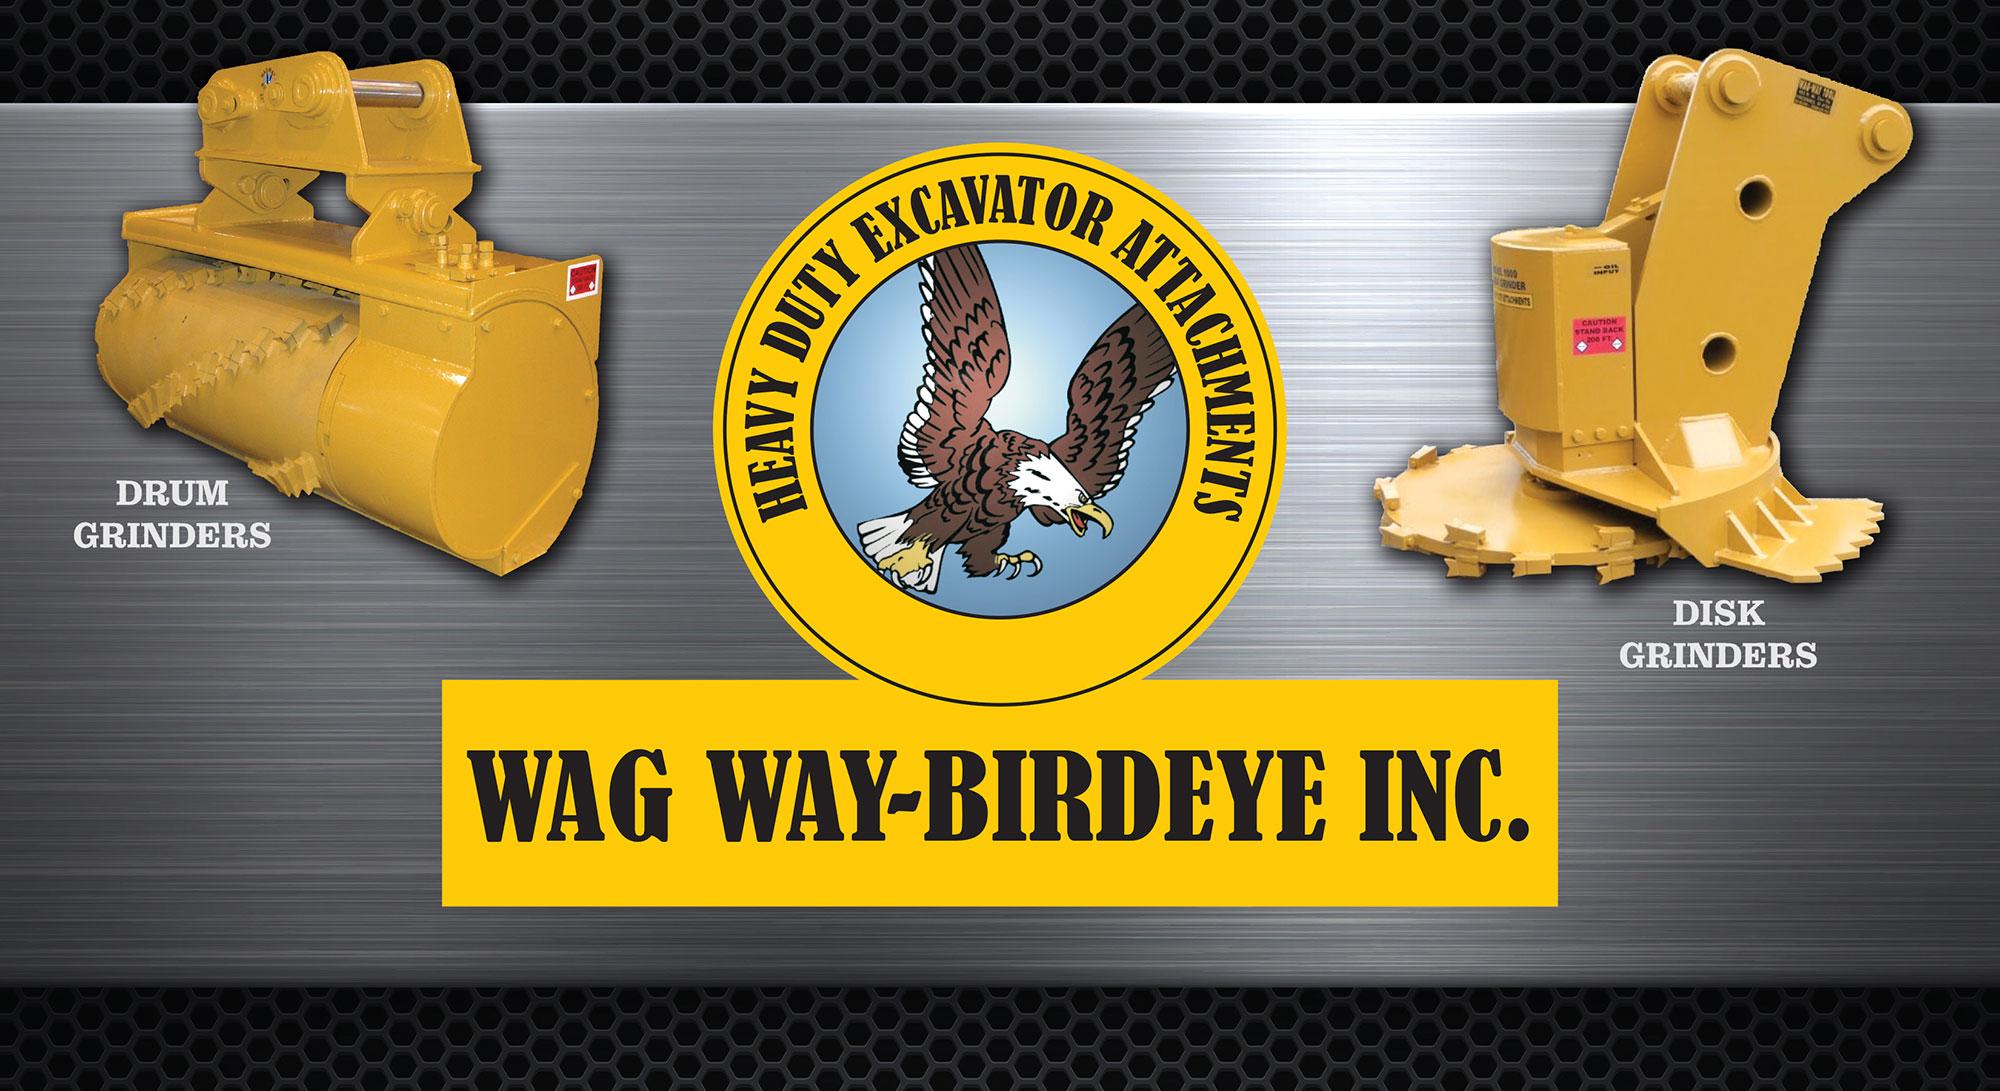 Wag Way-Birdeye Inc. - Heavy Duty Excavator Attachments